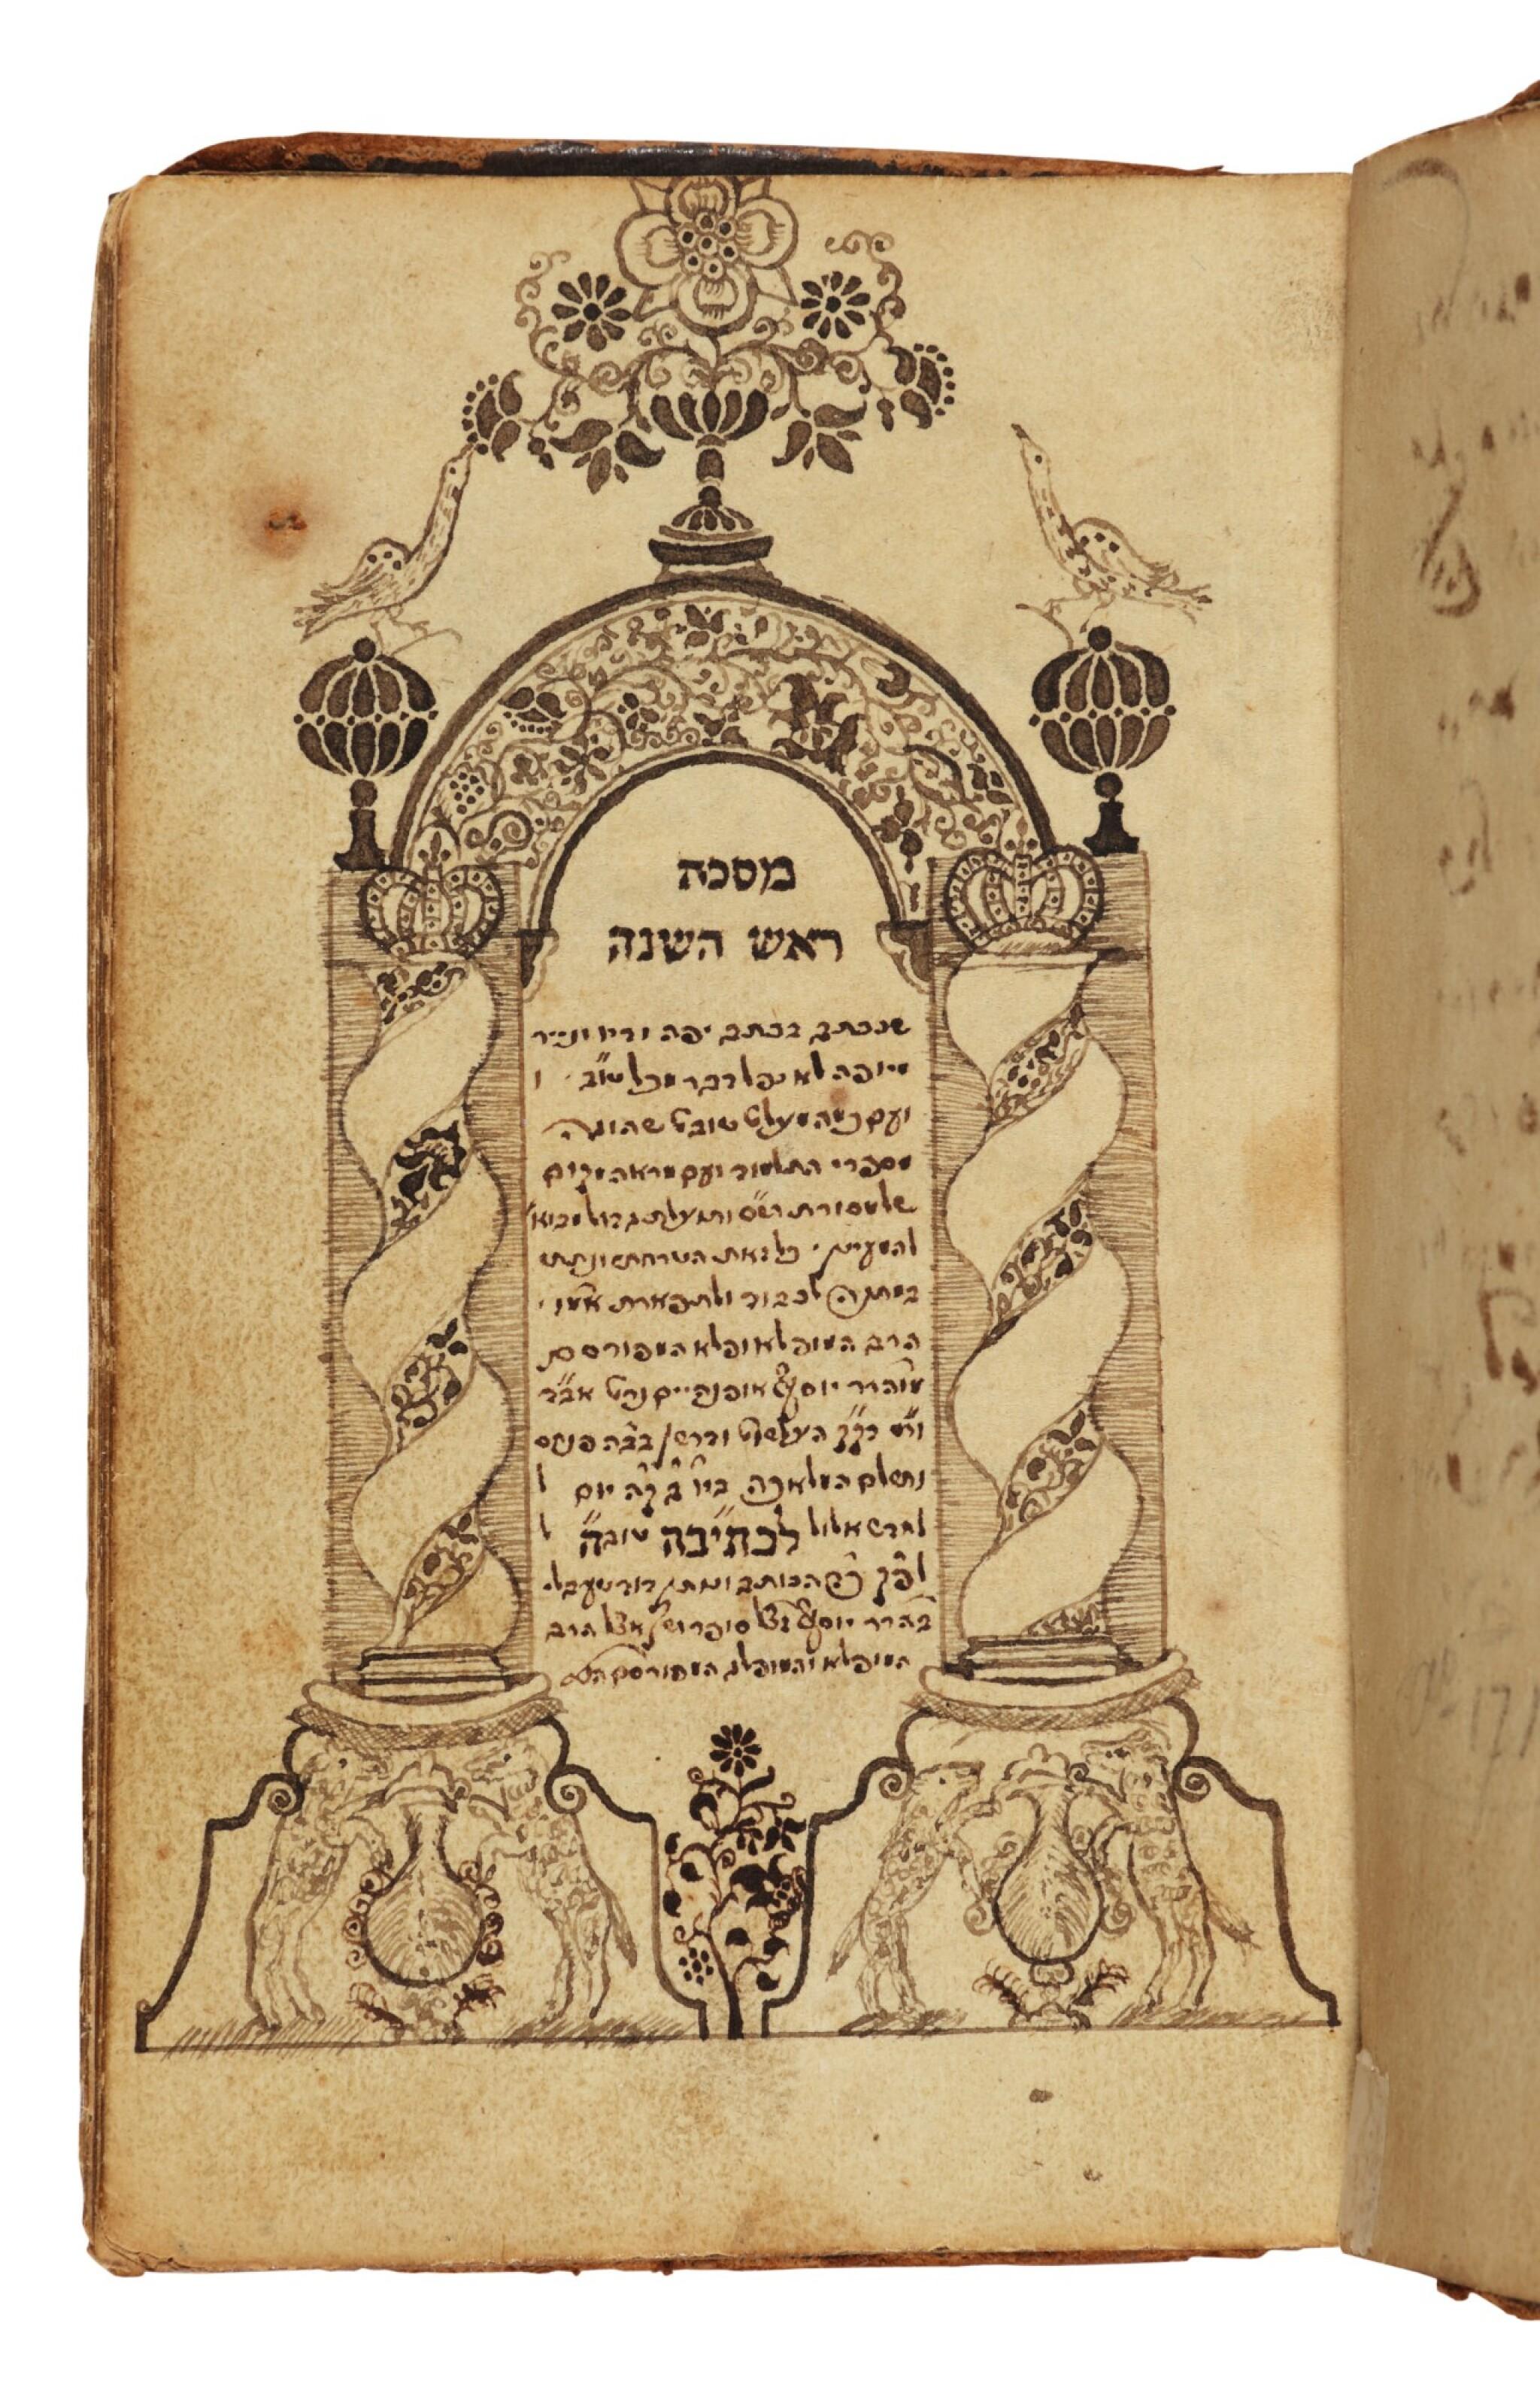 View full screen - View 1 of Lot 177. BABYLONIAN TALMUD, TRACTATE ROSH HA-SHANAH, WRITTEN ON BEHALF OF RABBI JOSEPH OPPENHEIM, SCRIBE: DAVID TEVELE BEN JOSEPH, [HOLEŠOV, MORAVIA]: 1712.